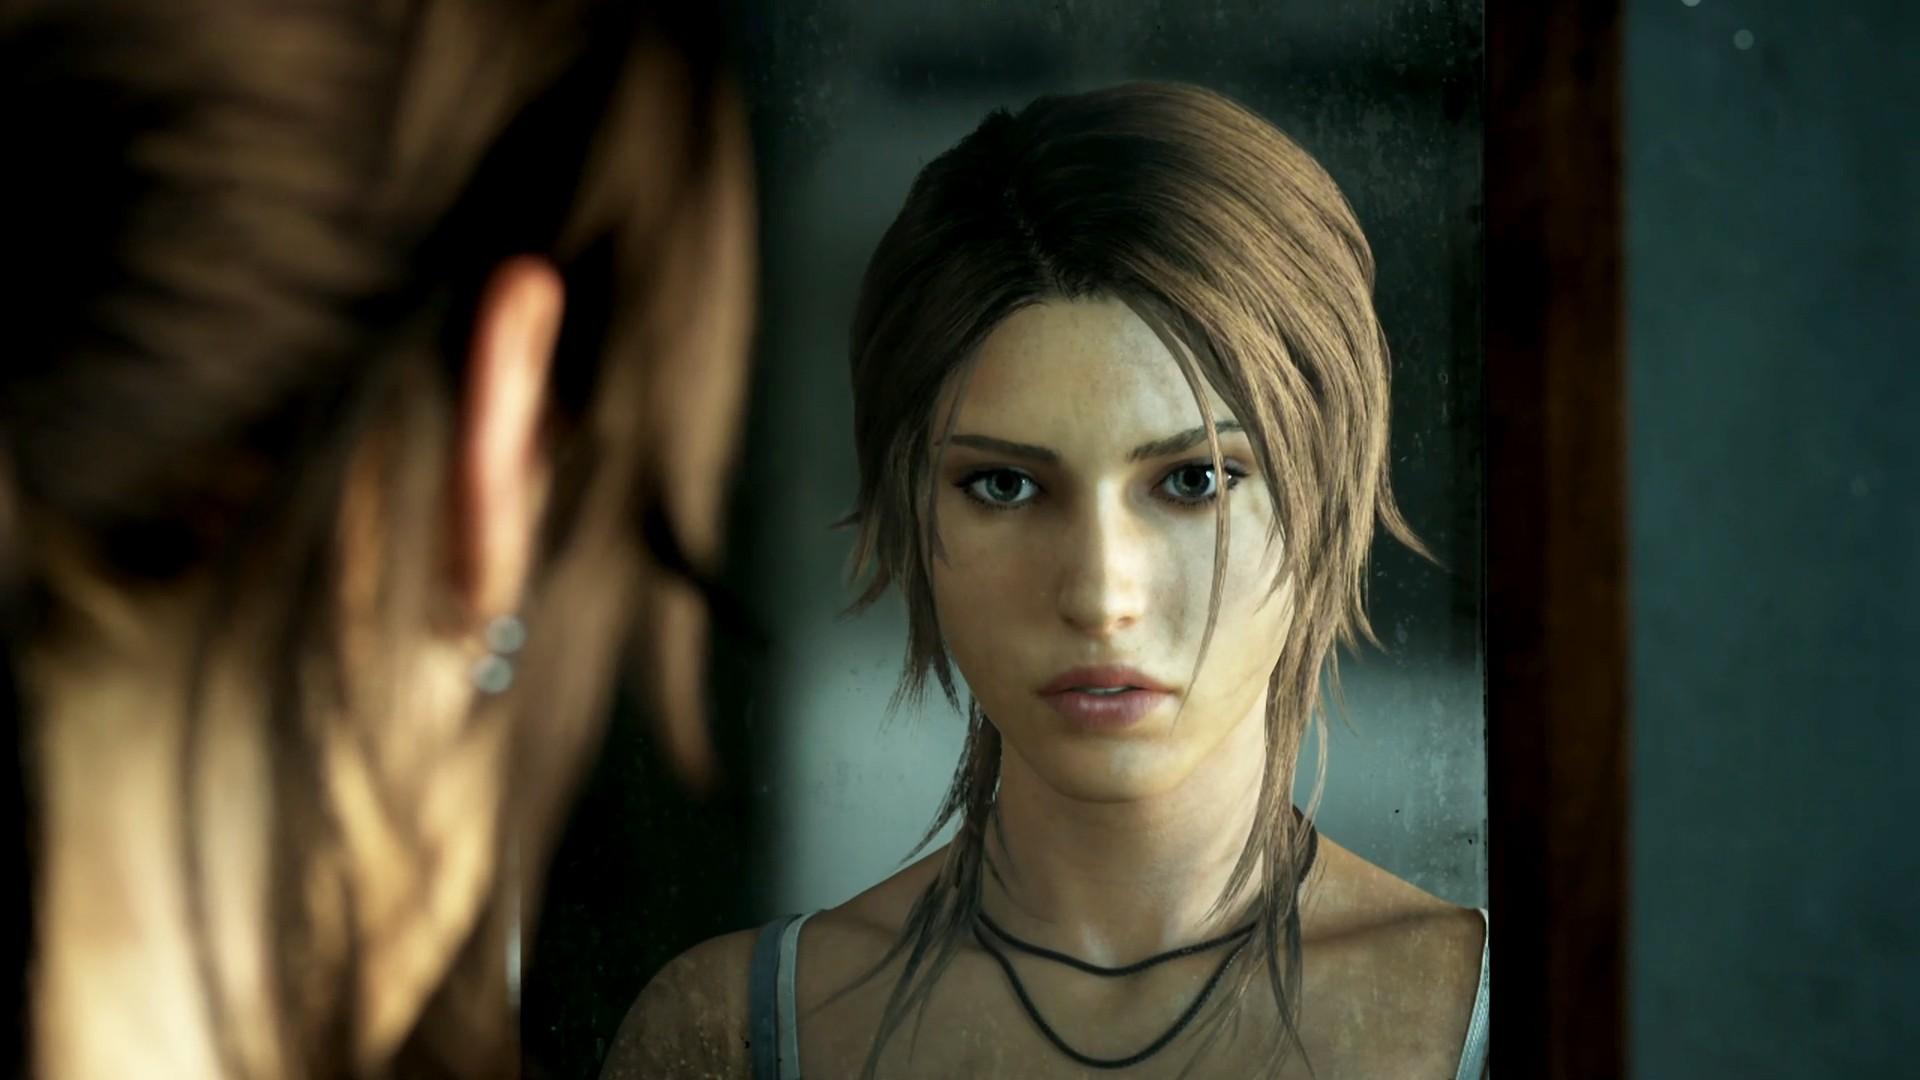 Wallpaper Face Video Games Model Fashion Hair Lara Croft